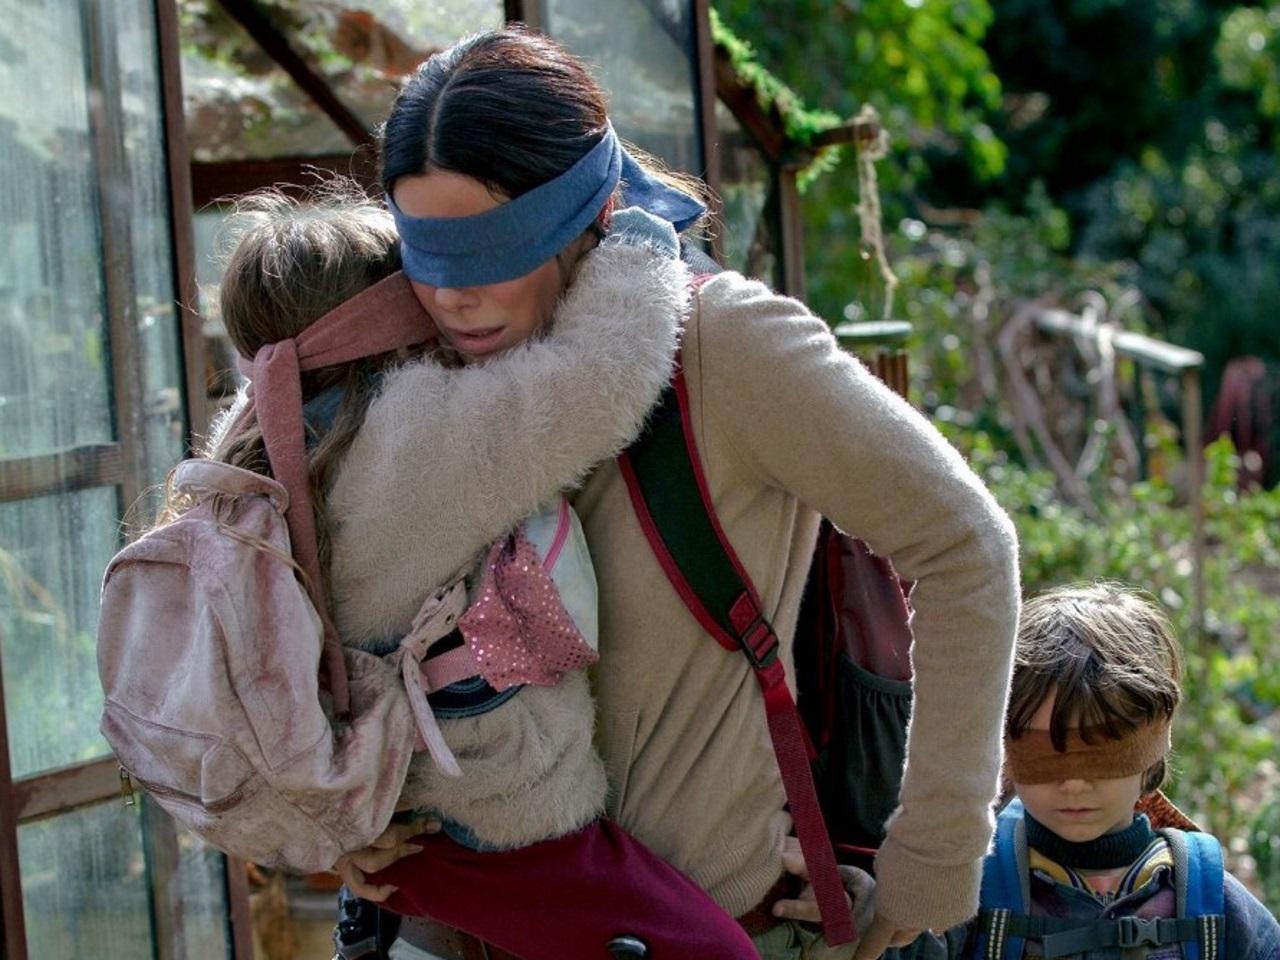 La mise en garde de la gendarmerie de Gironde — Bird Box Challenge